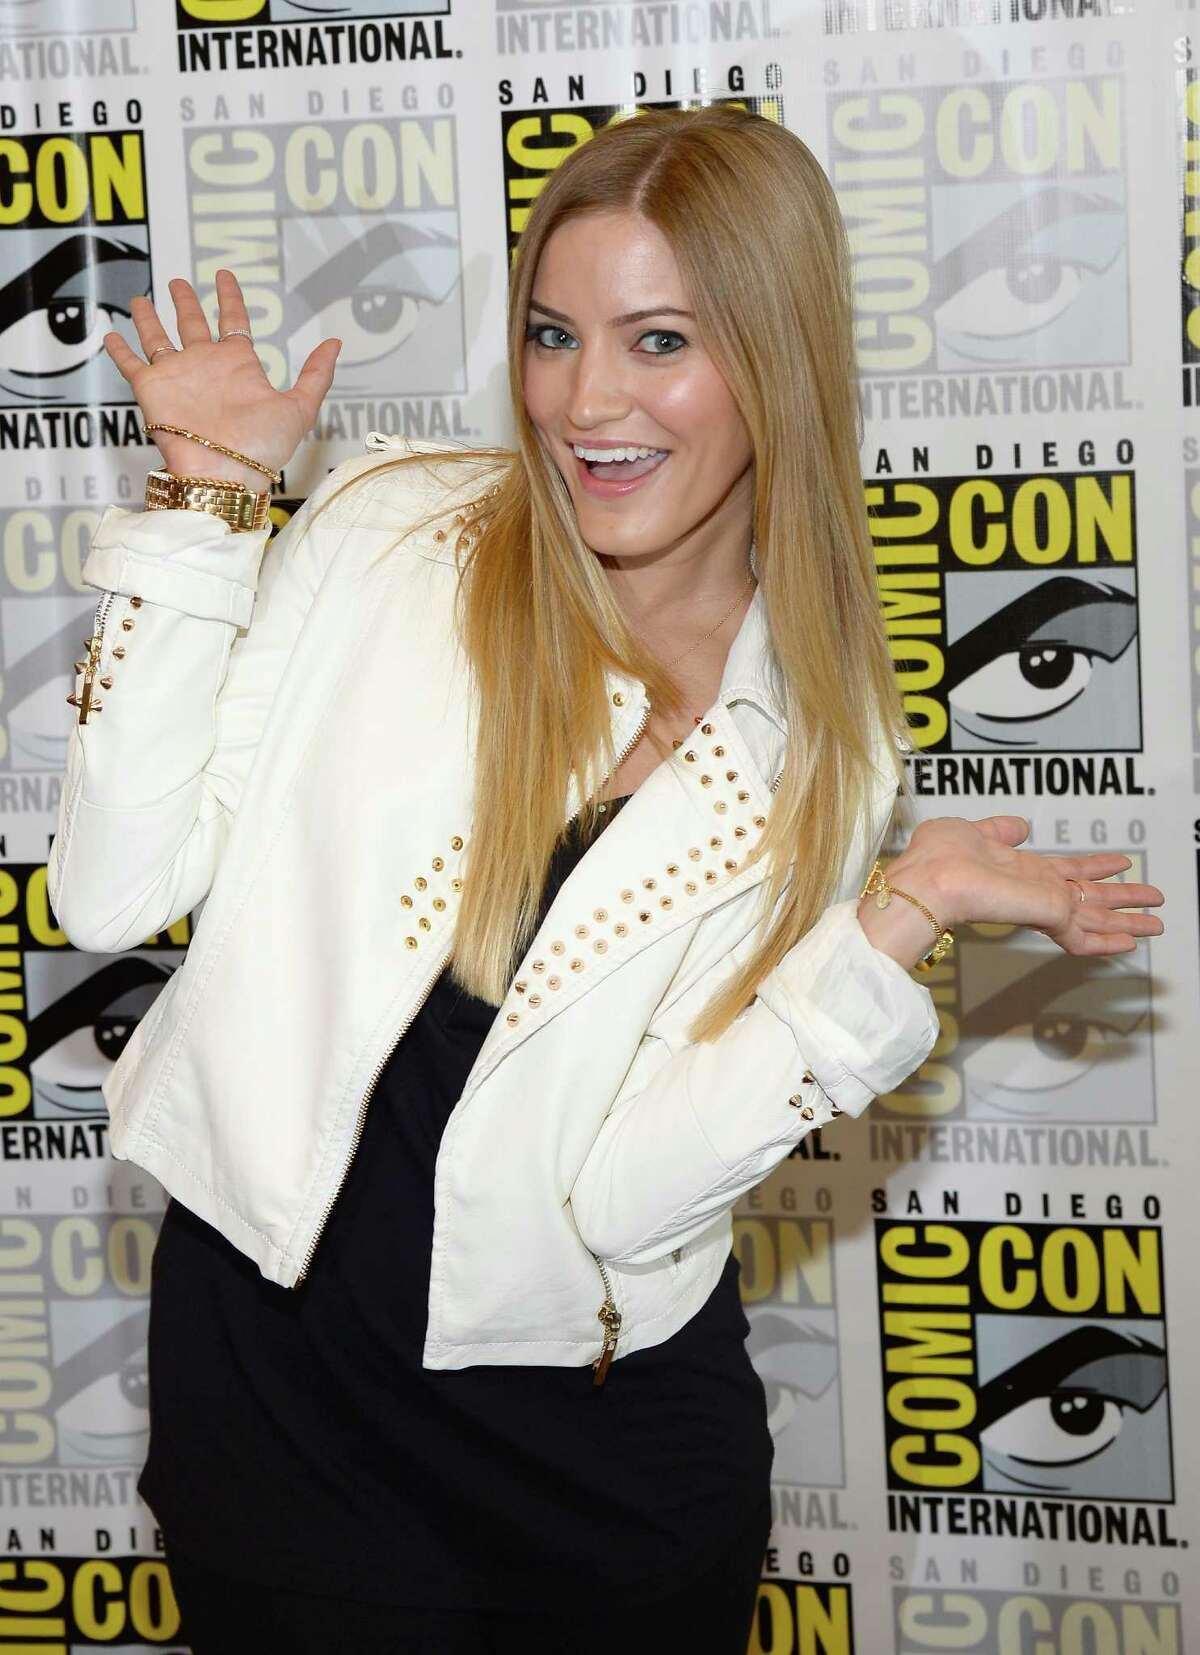 "Actress Justine ""iJustine"" Ezarik at Comic-Con International 2013 at the Hilton San Diego Bayfront Hotel on July 18, 2013 in San Diego, California."